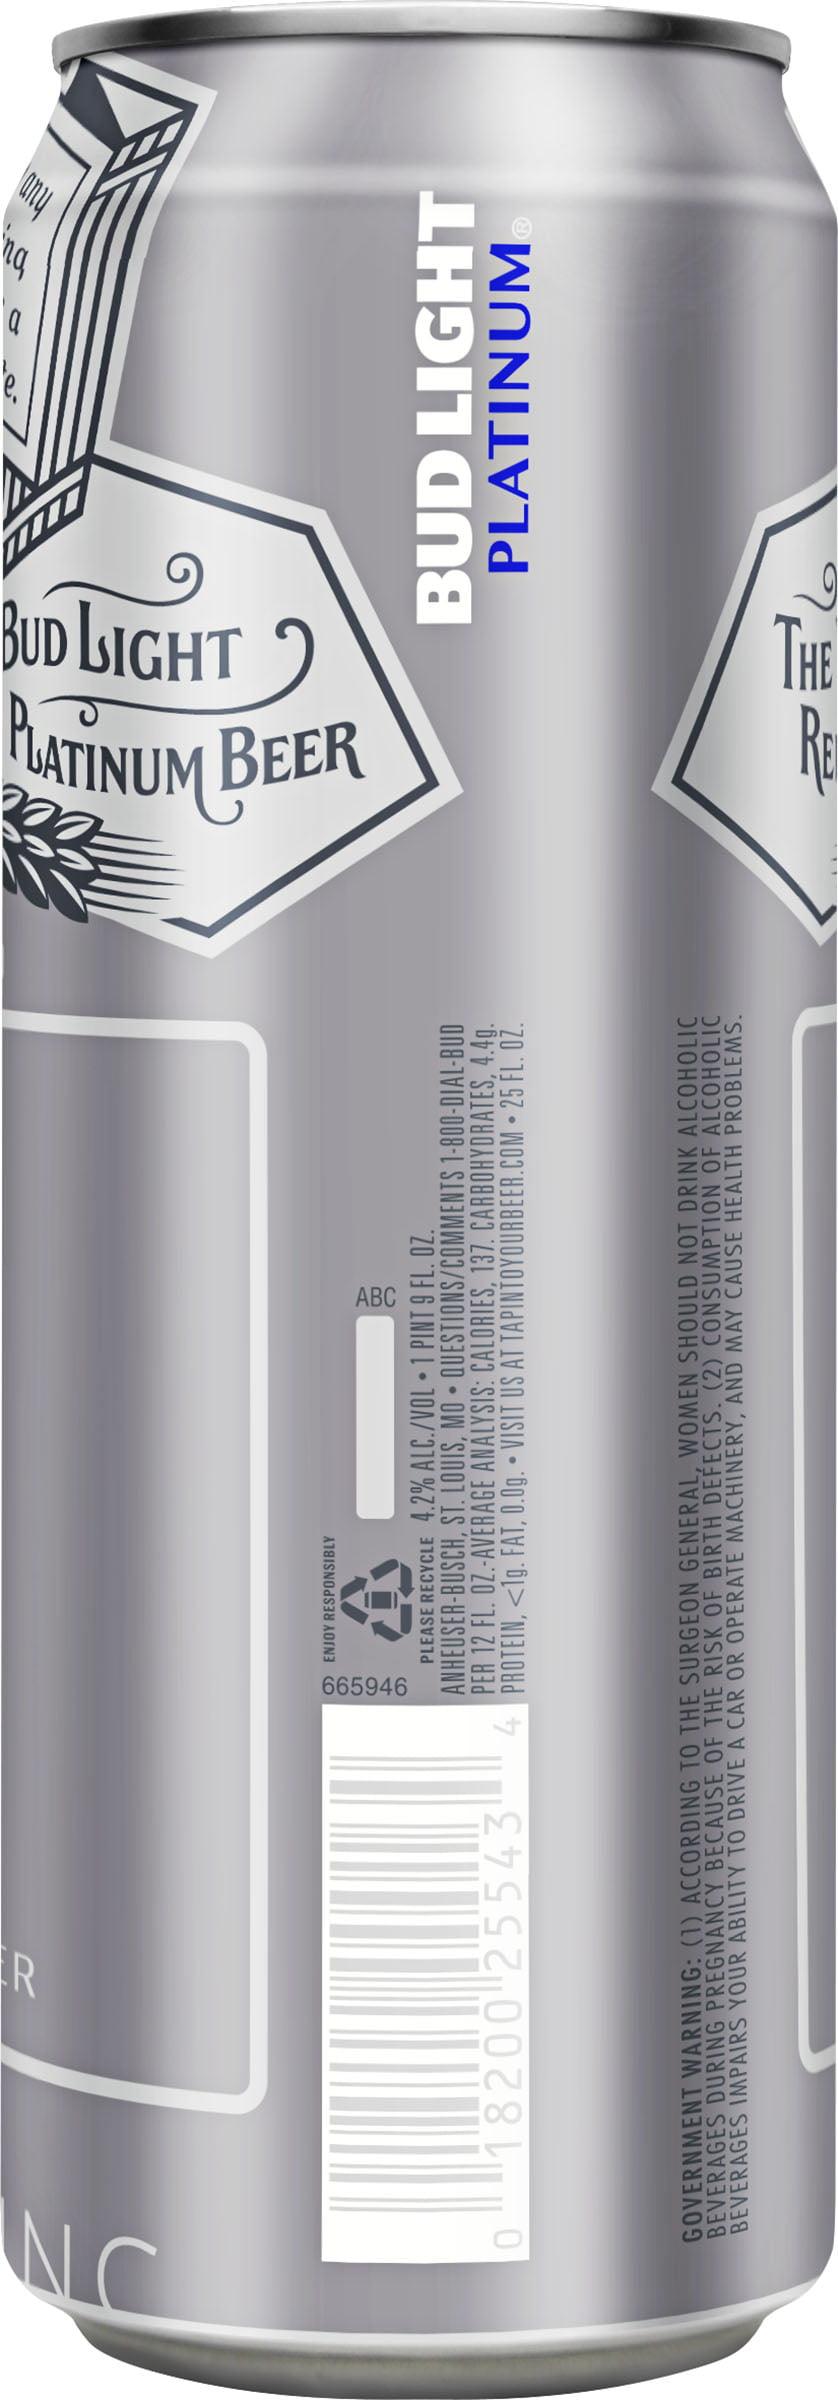 Bud Light Platinum Beer fl oz Walmart